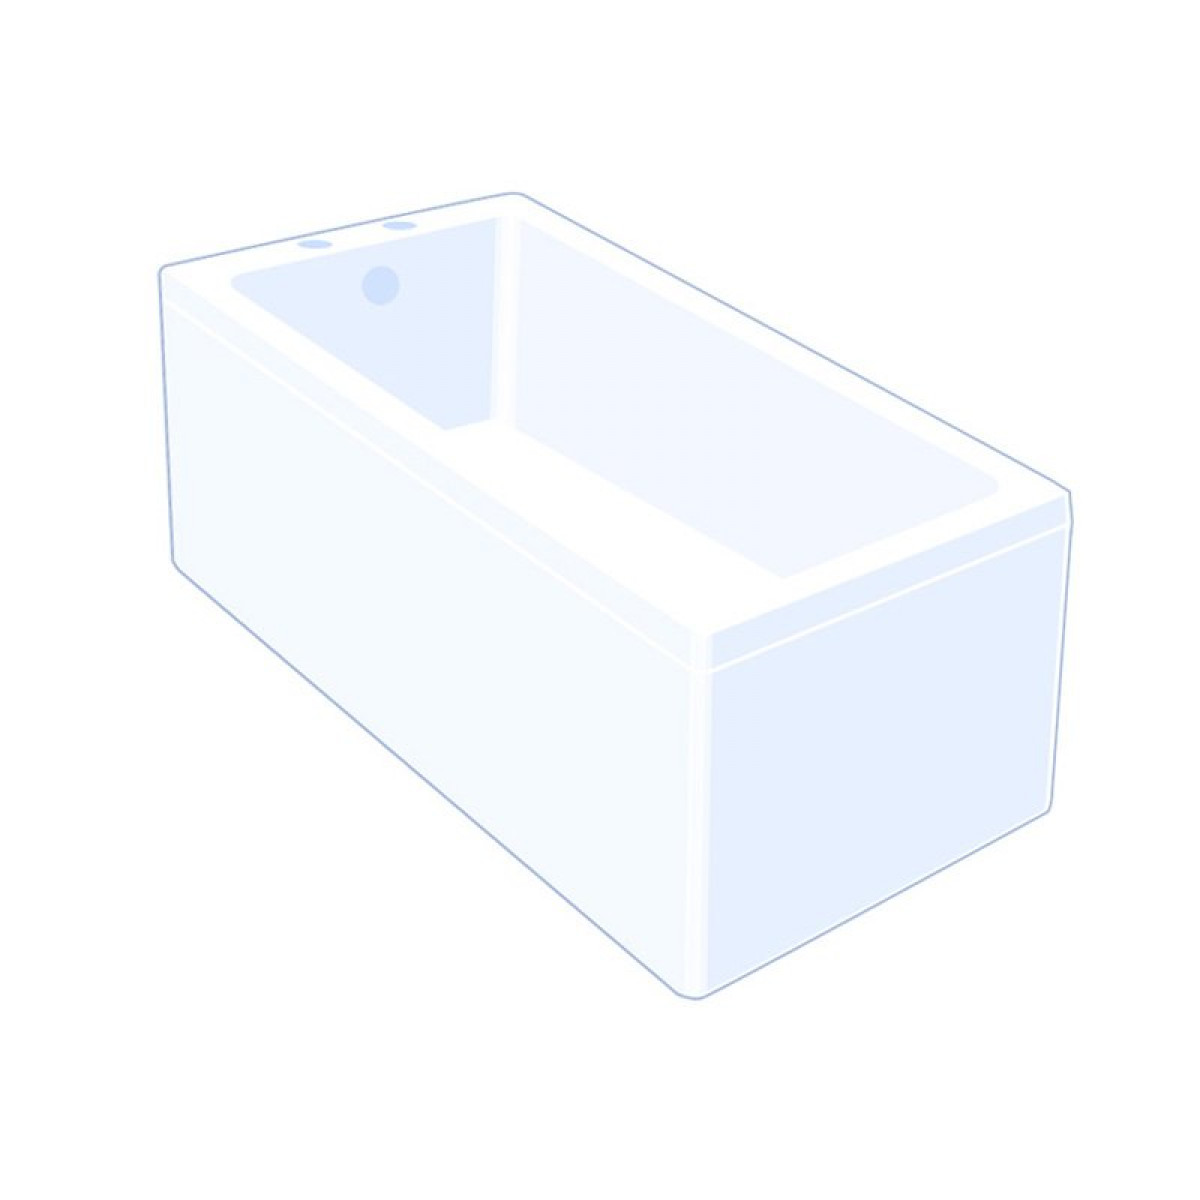 Carron Carronite Quantum Single Ended Bath 1800 x 725mm -